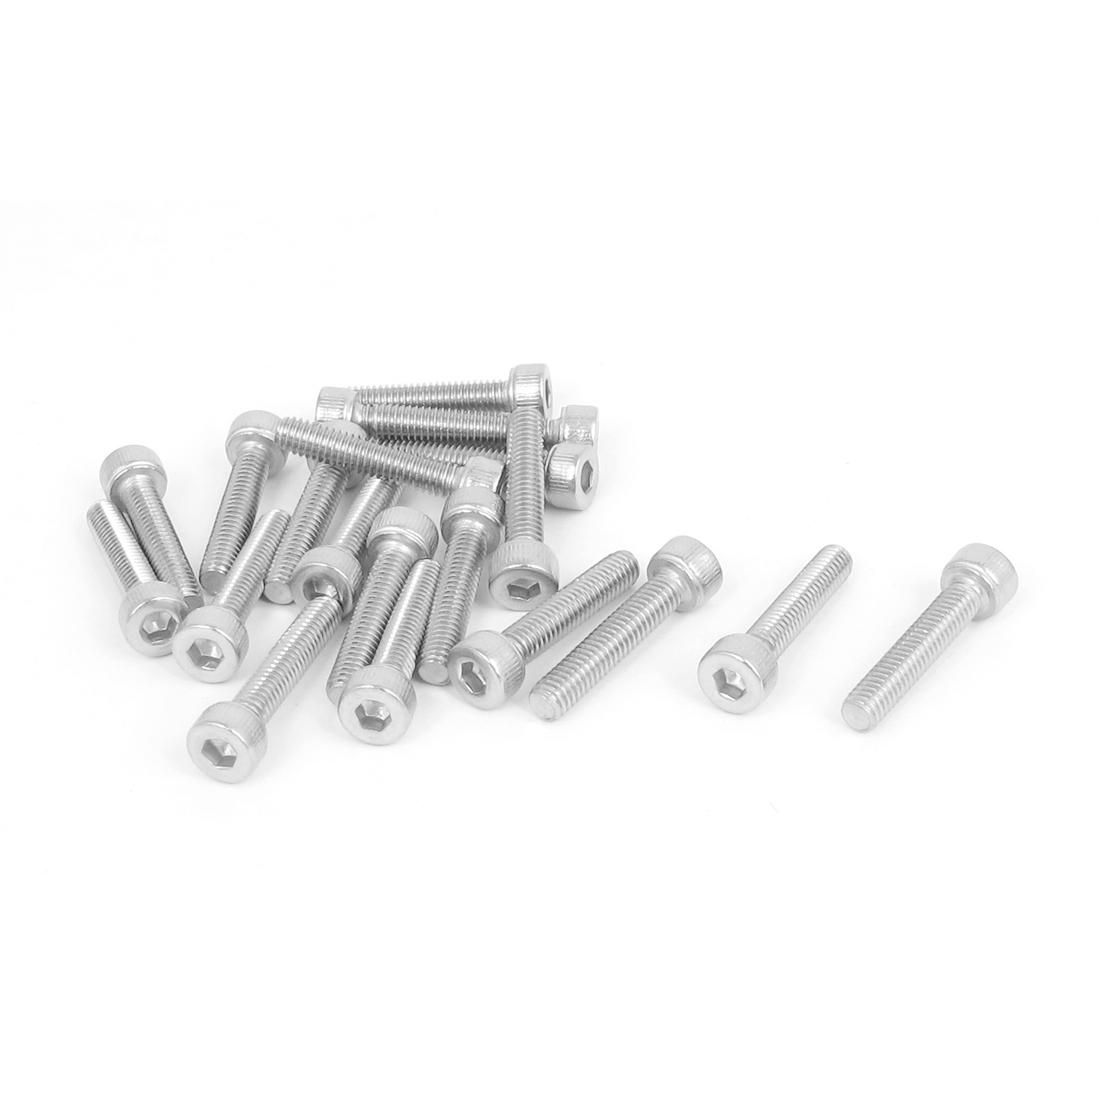 M4x20mm Thread 304 Stainless Steel Hex Key Bolt Socket Head Cap Screws 20pcs